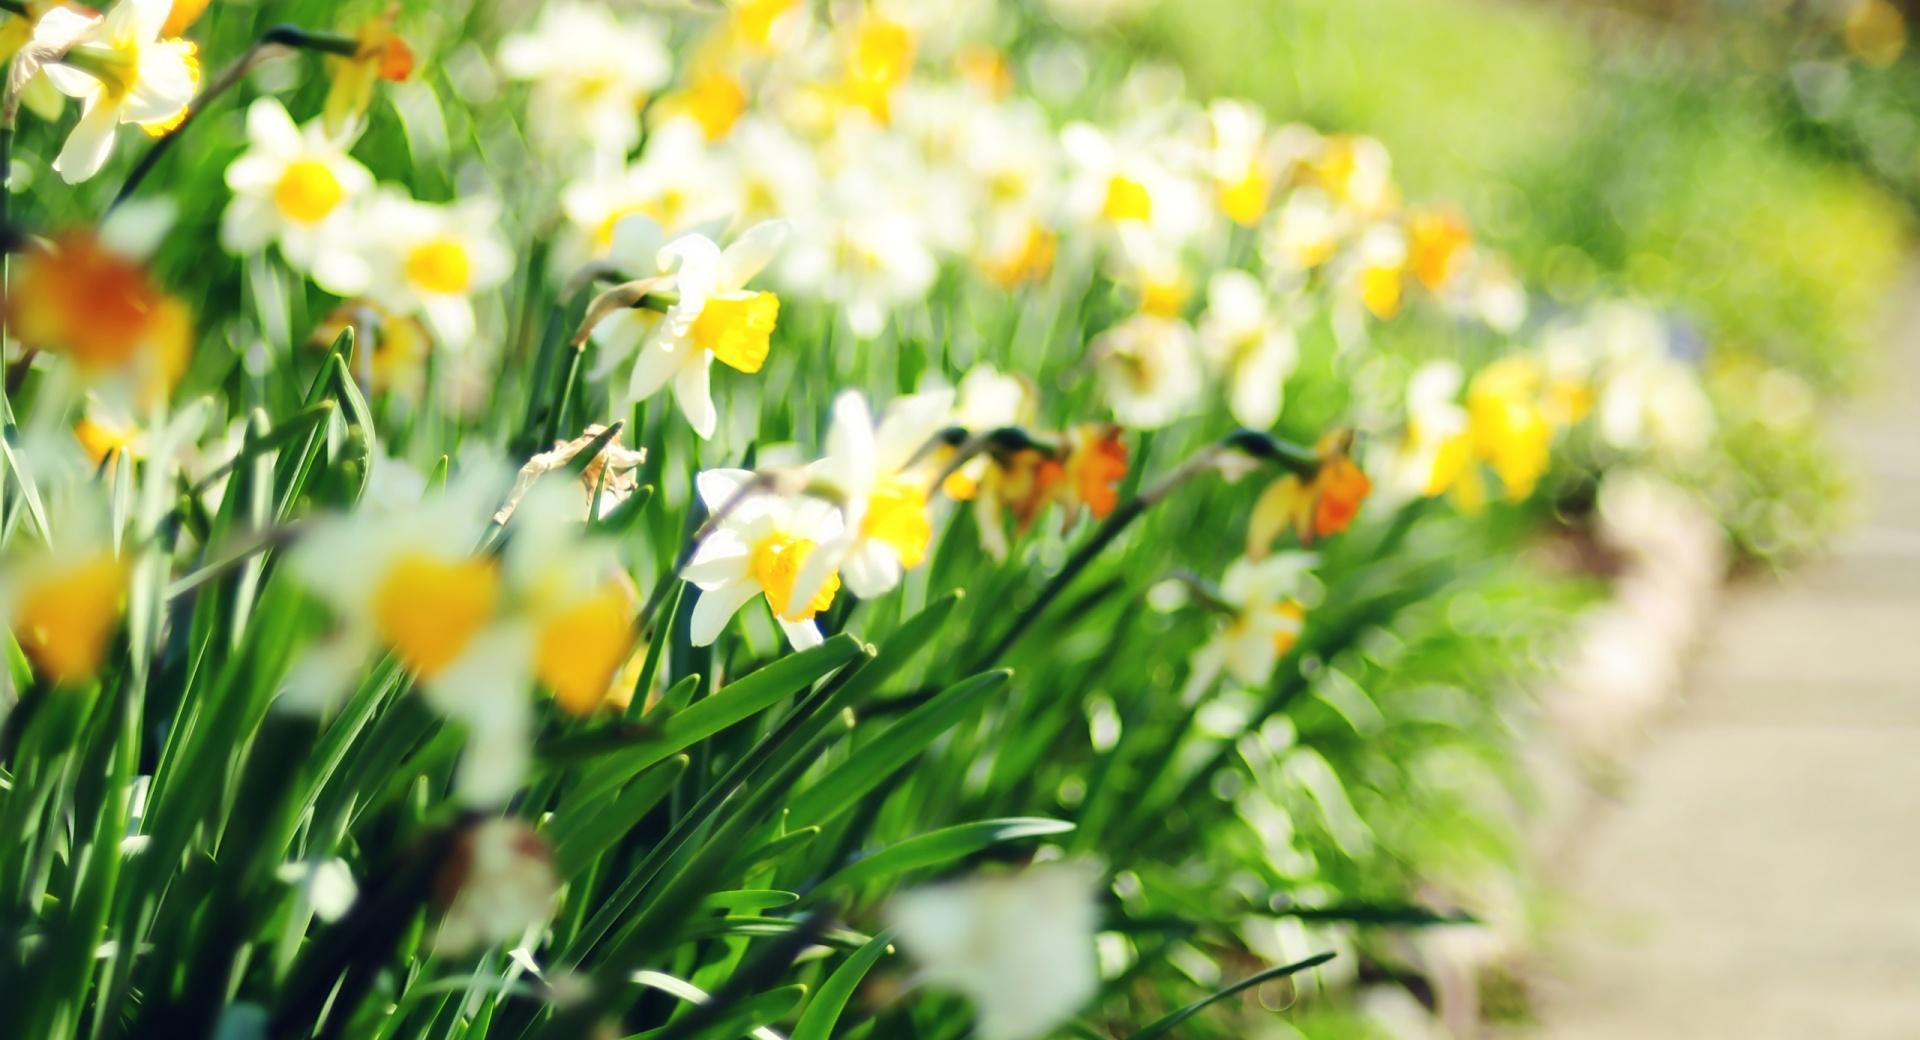 Daffodil Lane wallpapers HD quality